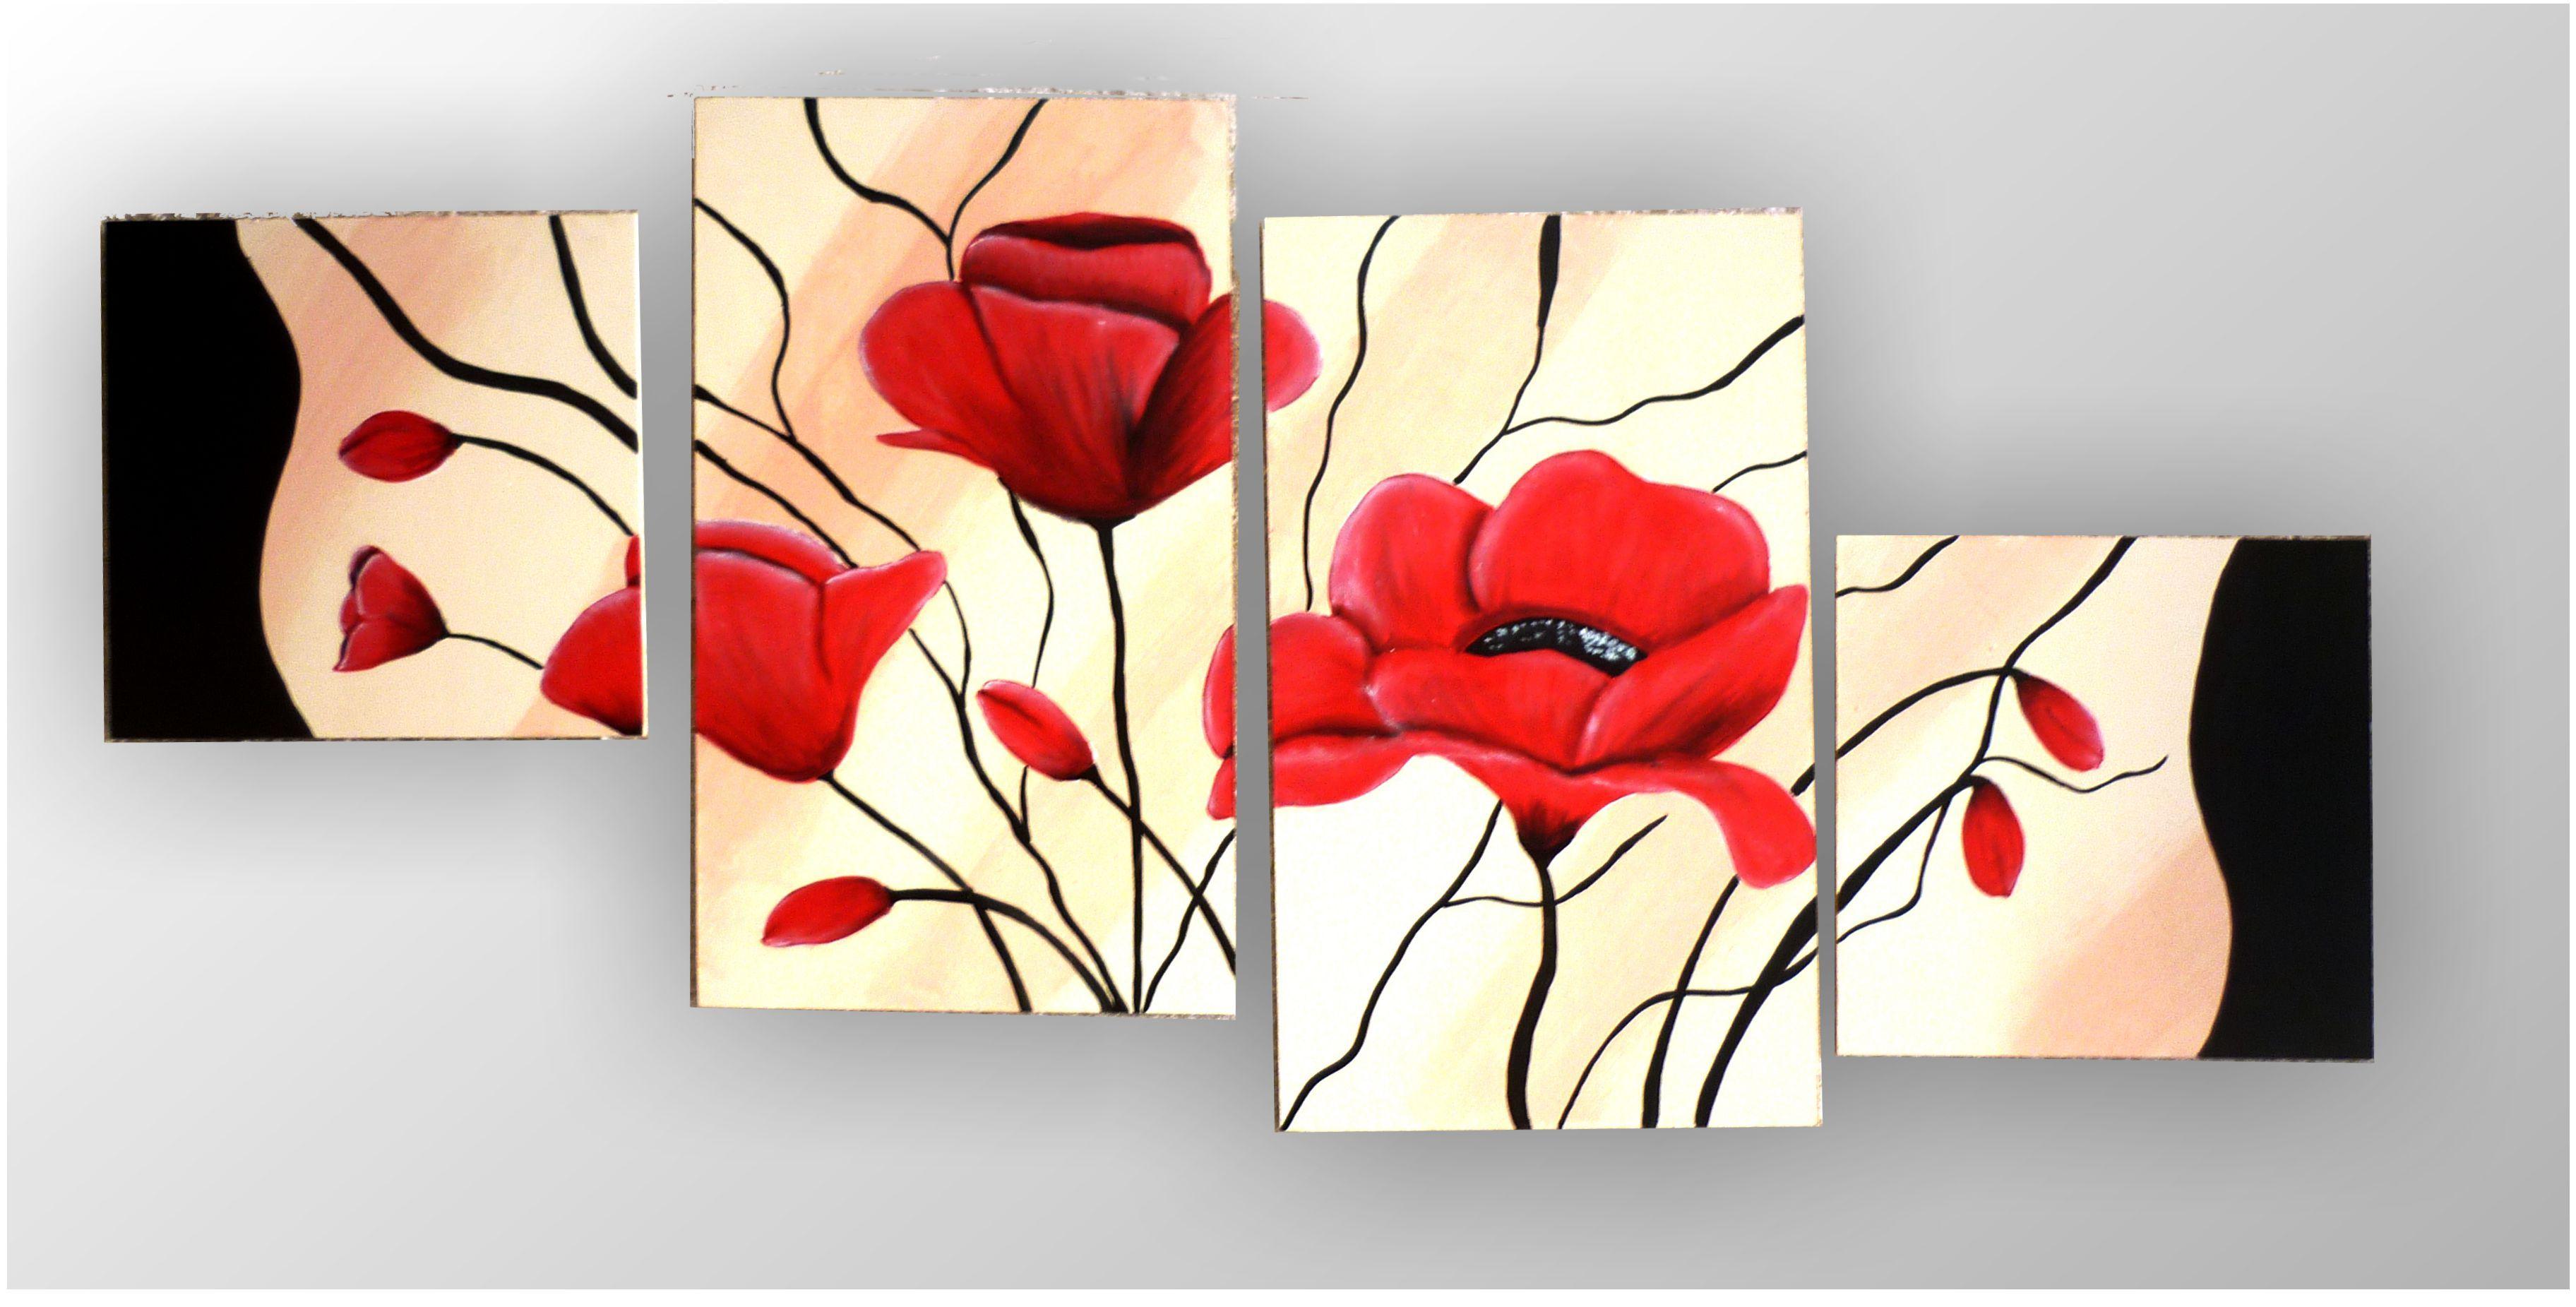 Cuadros modernos con flores pictures imagenes 2016 - Cuadros para comedor moderno ...